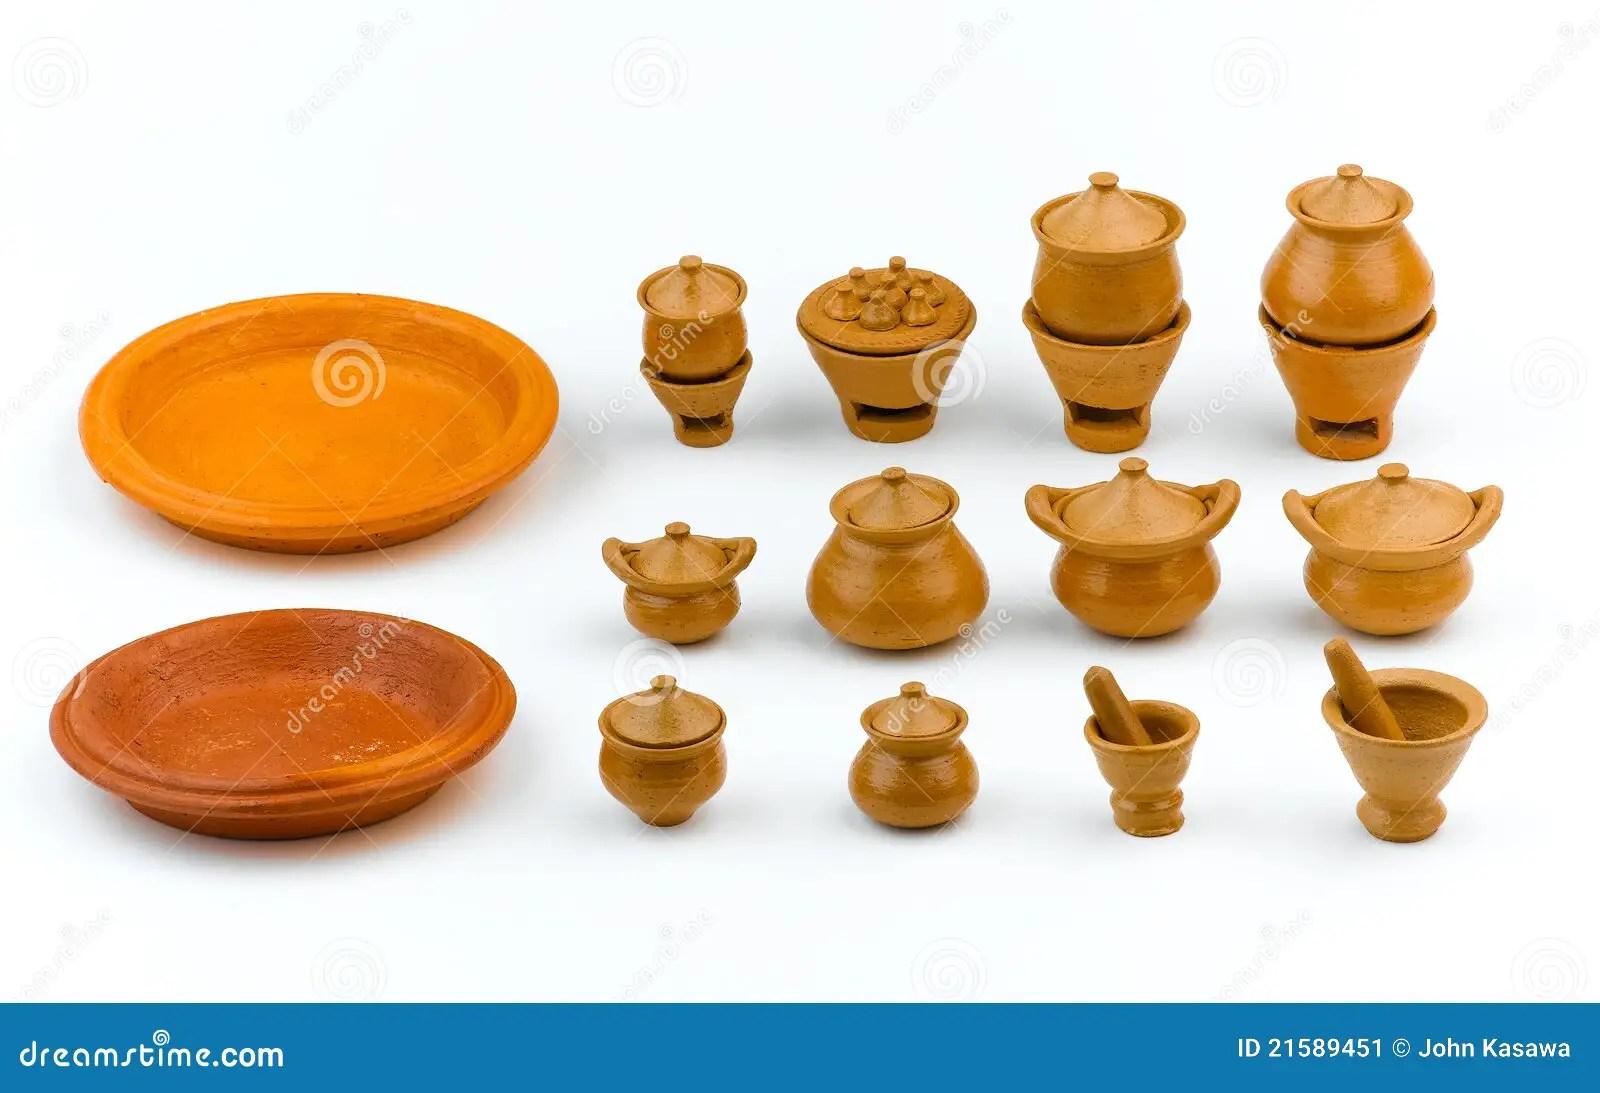 kitchen miniature laminate table 黏土厨房微型瓦器玩具库存图片 图片包括有烹调 作用 黏土 被恫吓的 了解微型瓦器俏丽的玩具的黏土逗人喜爱的孩子厨房